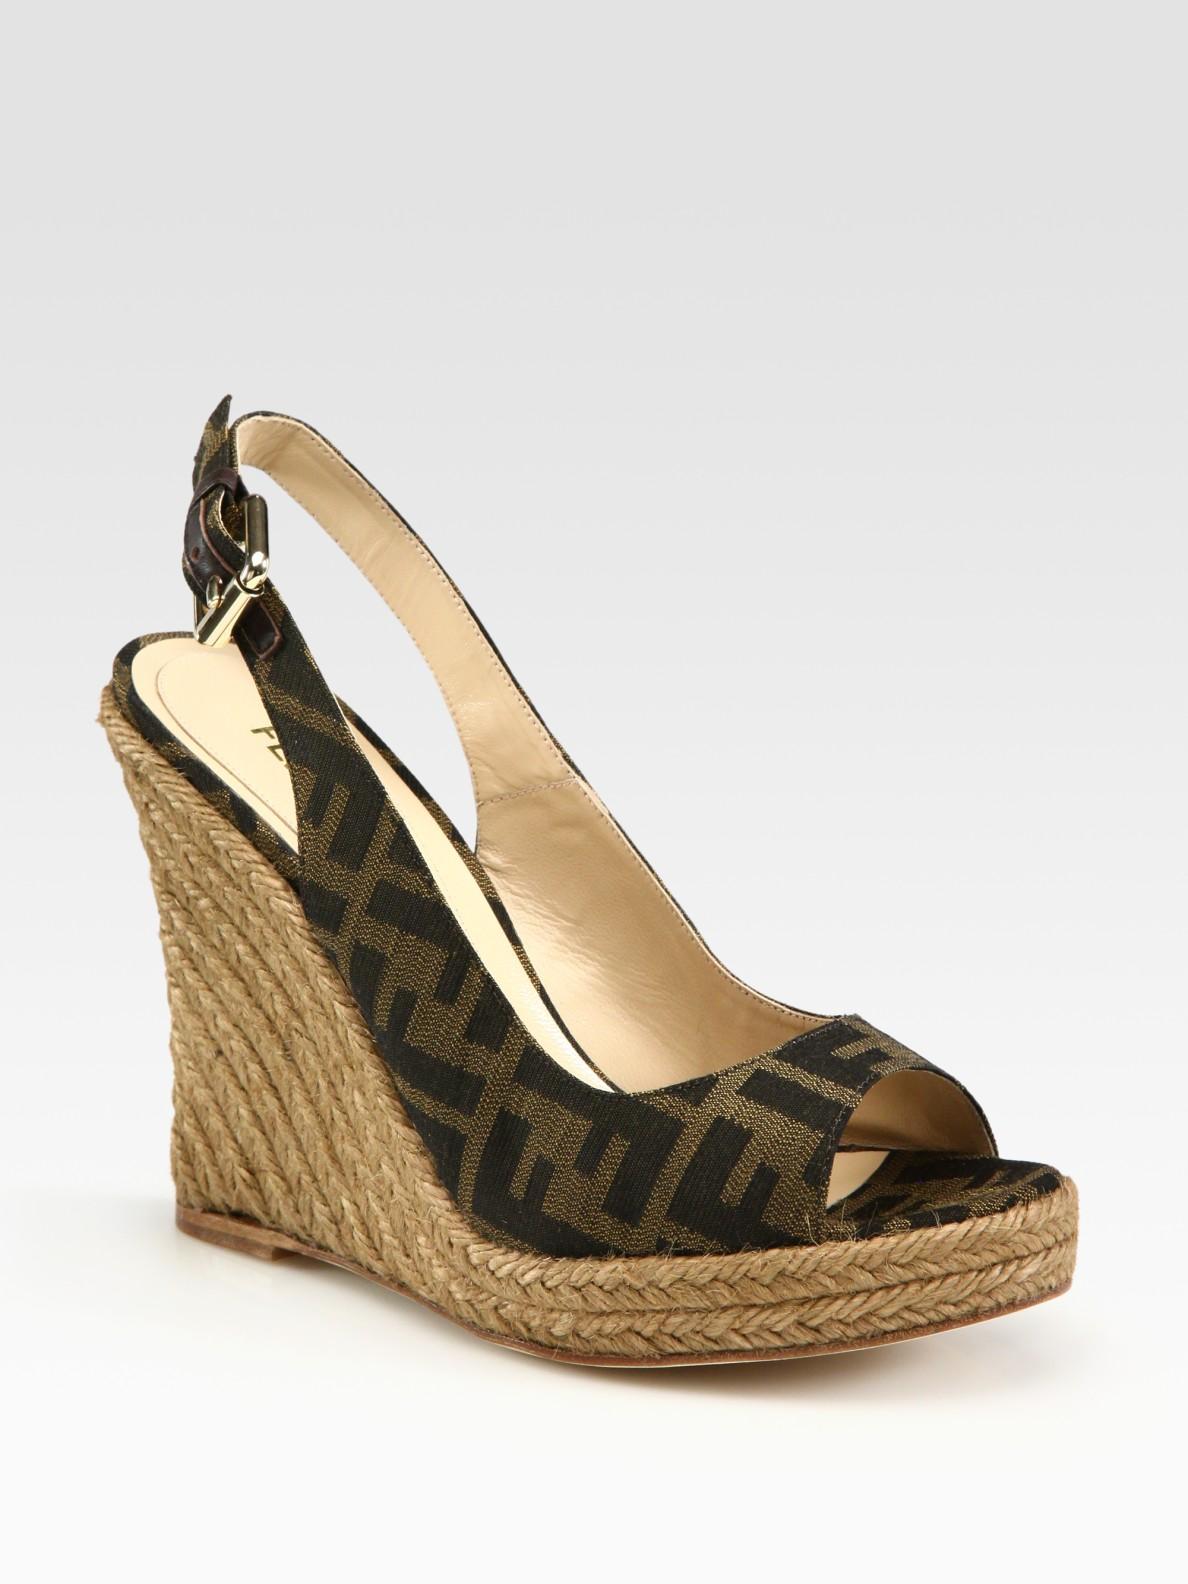 fendi monogram canvas slingback espadrille wedge sandals